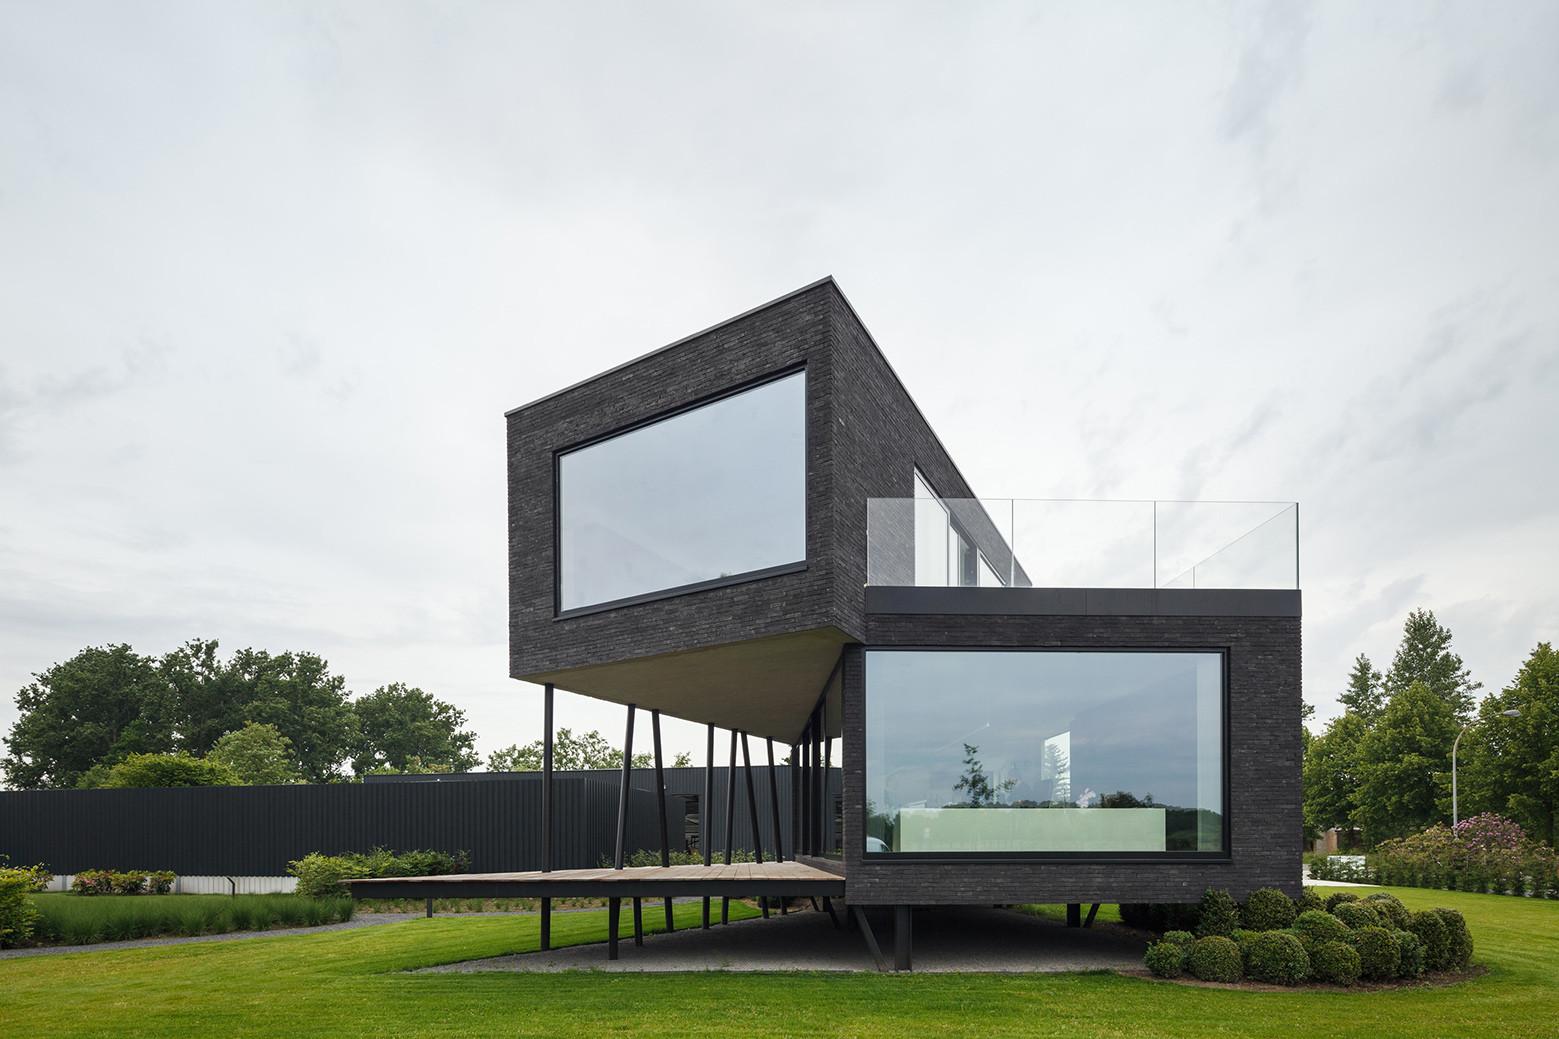 Office NETE / architectenbureau Wil-Ma, © Stijn Bollaert